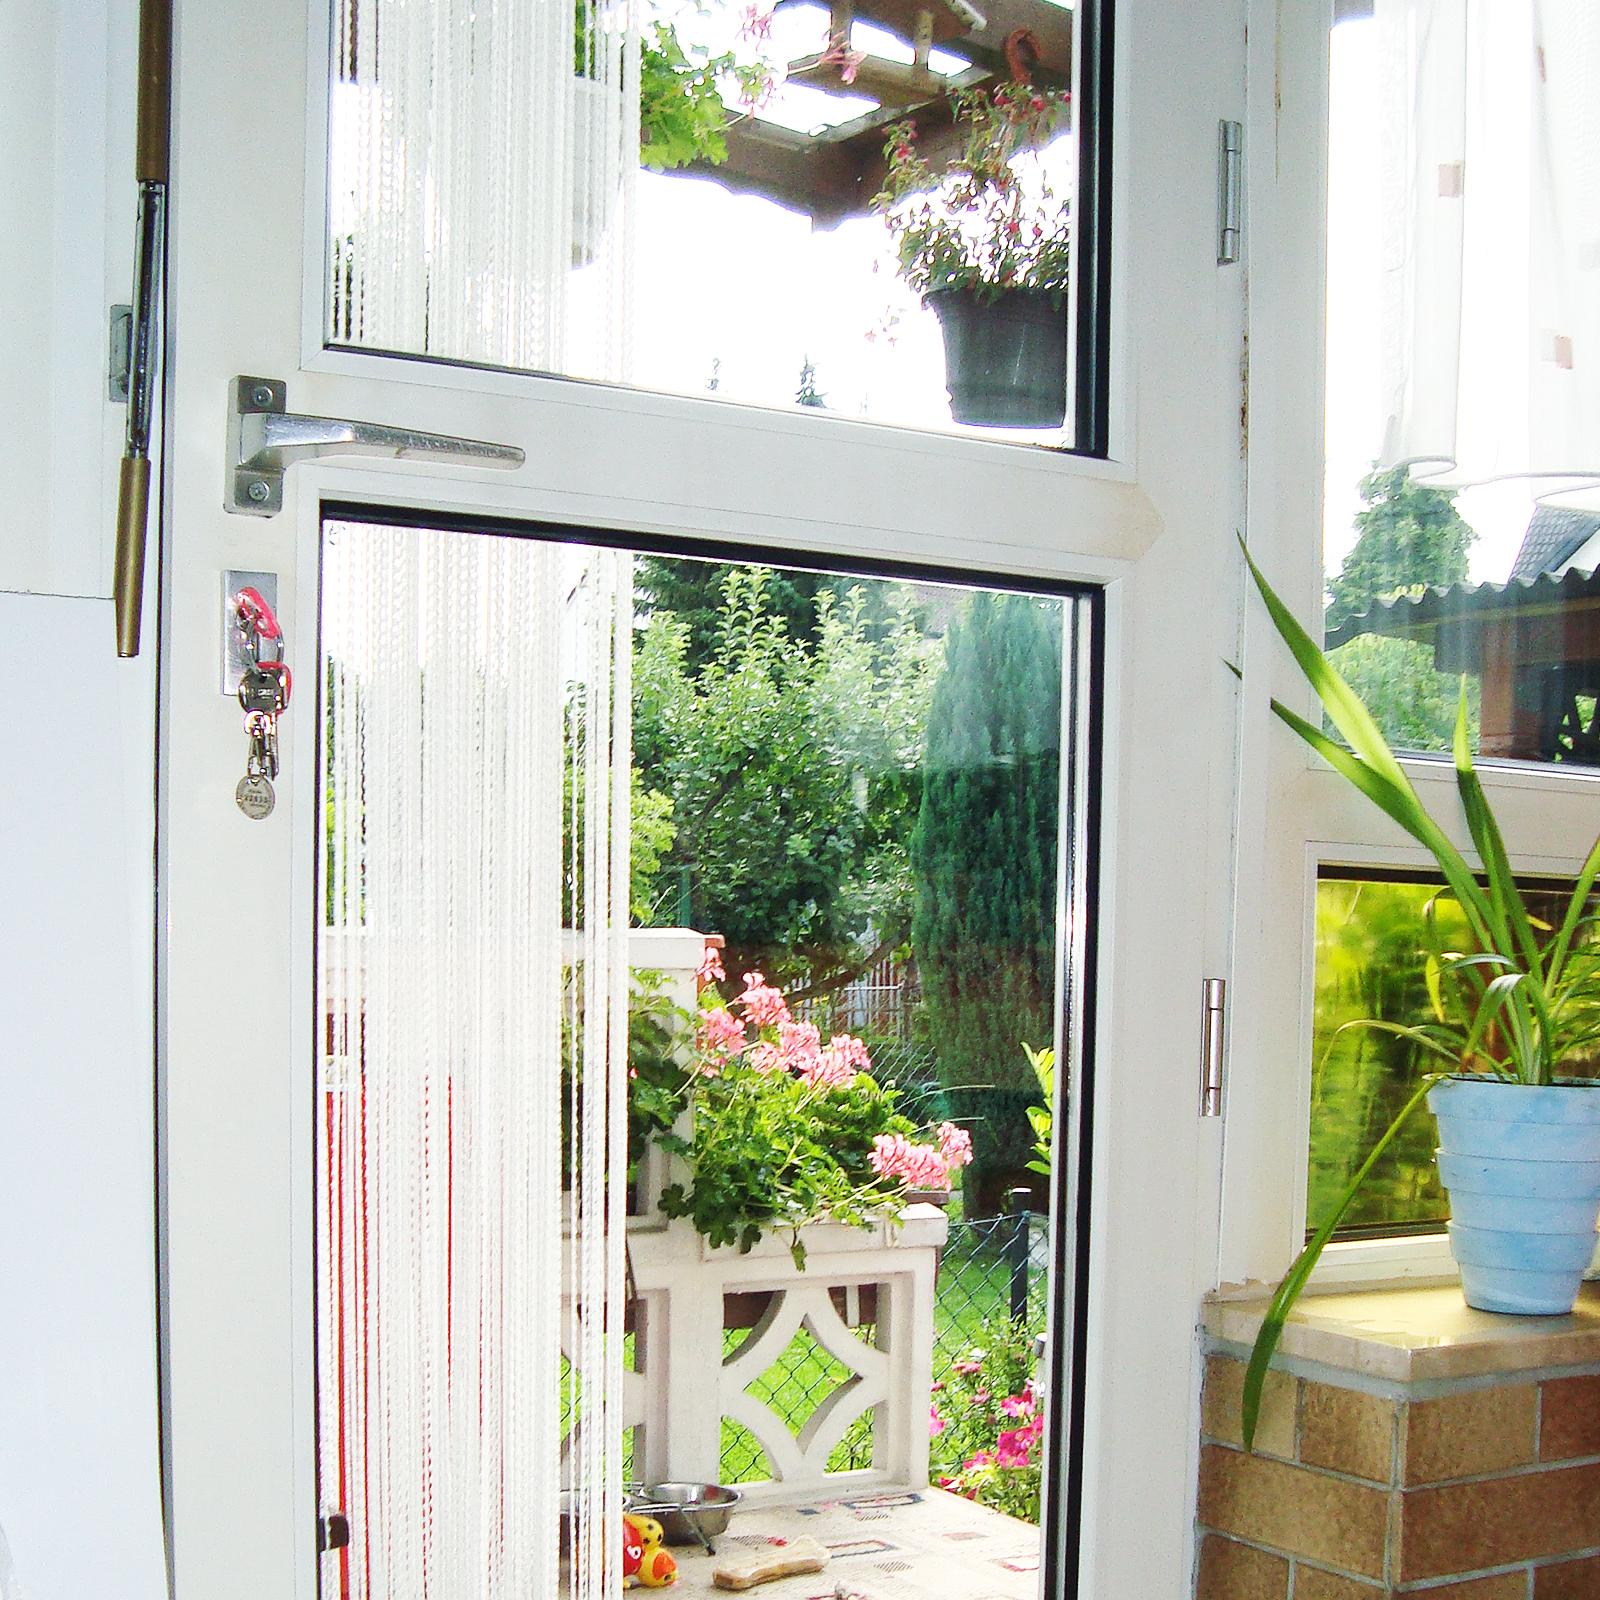 Isolierglasscheibe in Balkontür